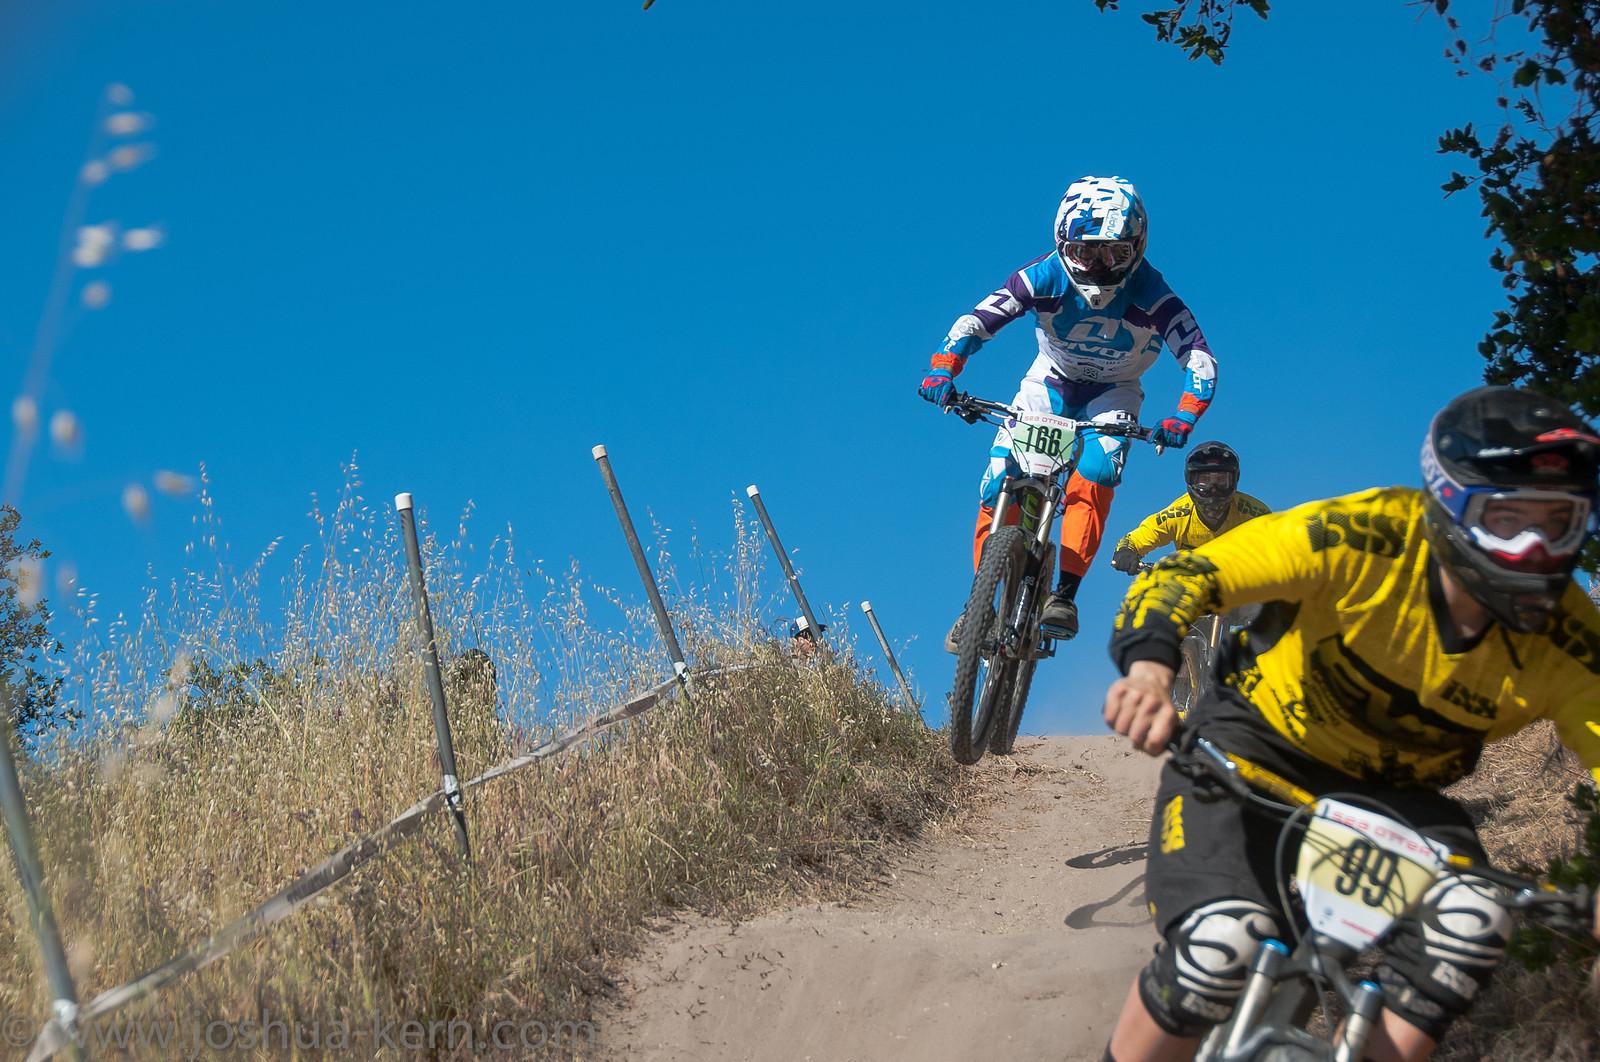 4-19-13DHPractice (26 of 36) - jkern620 - Mountain Biking Pictures - Vital MTB